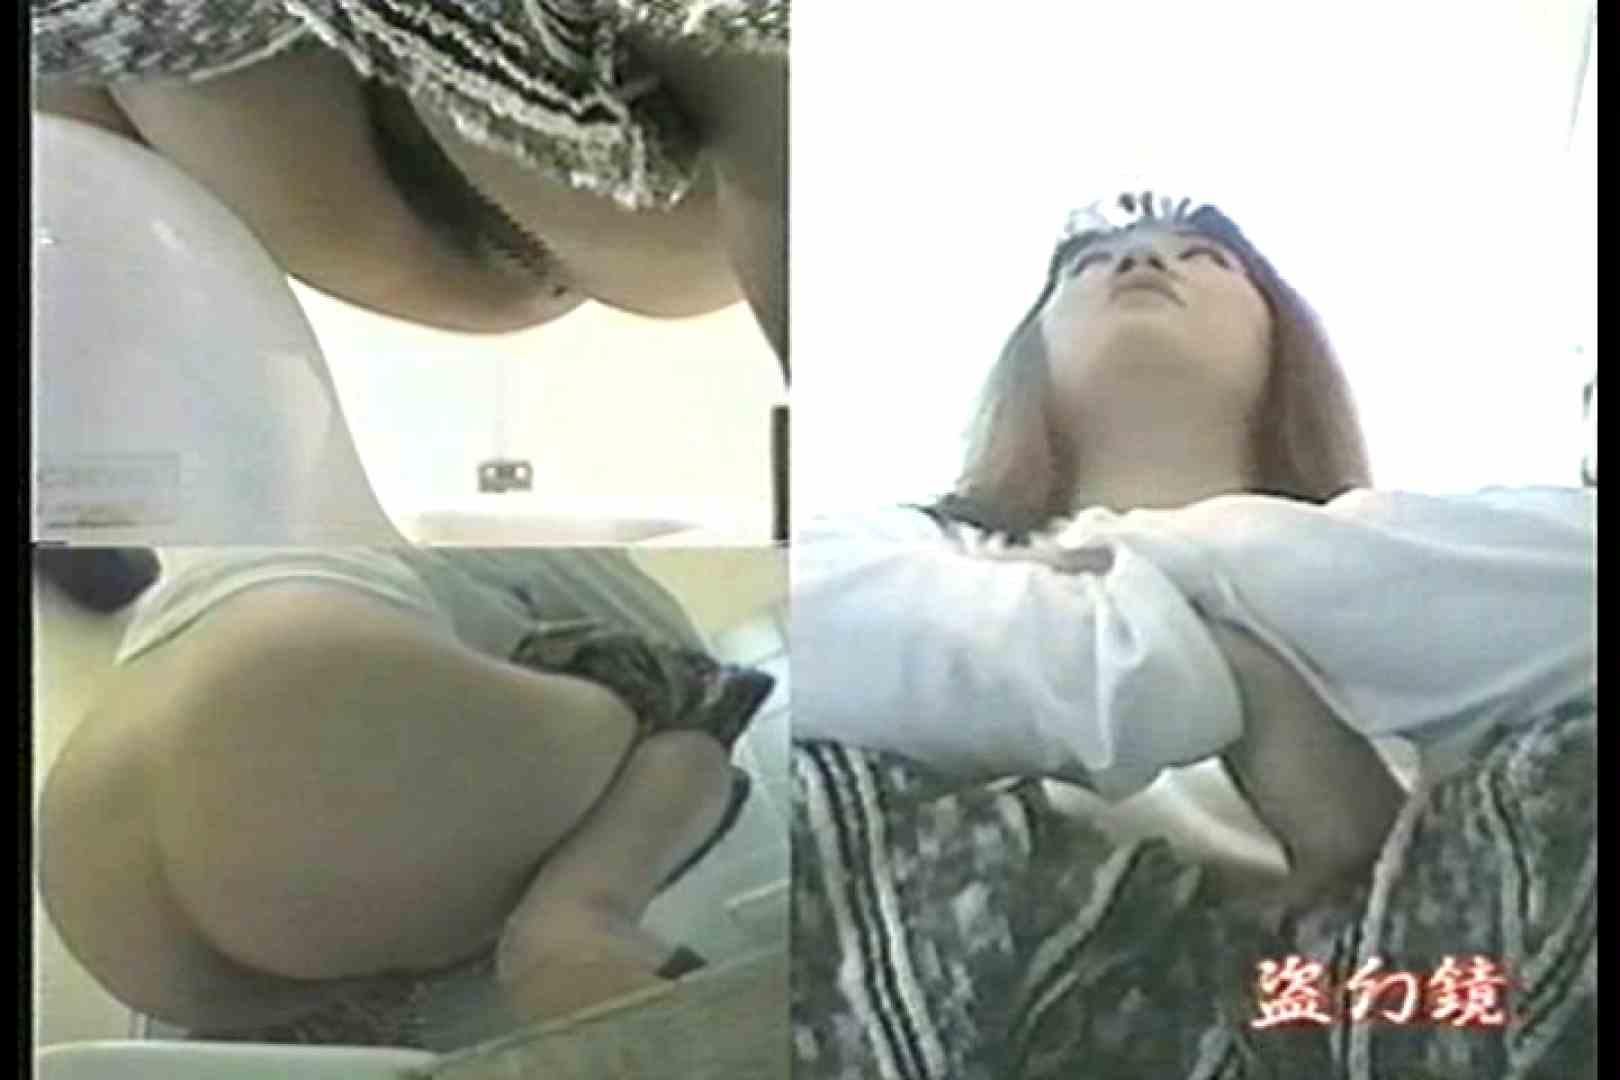 洗面所羞恥美女んMV-2 肛門 ヌード画像 70PIX 29